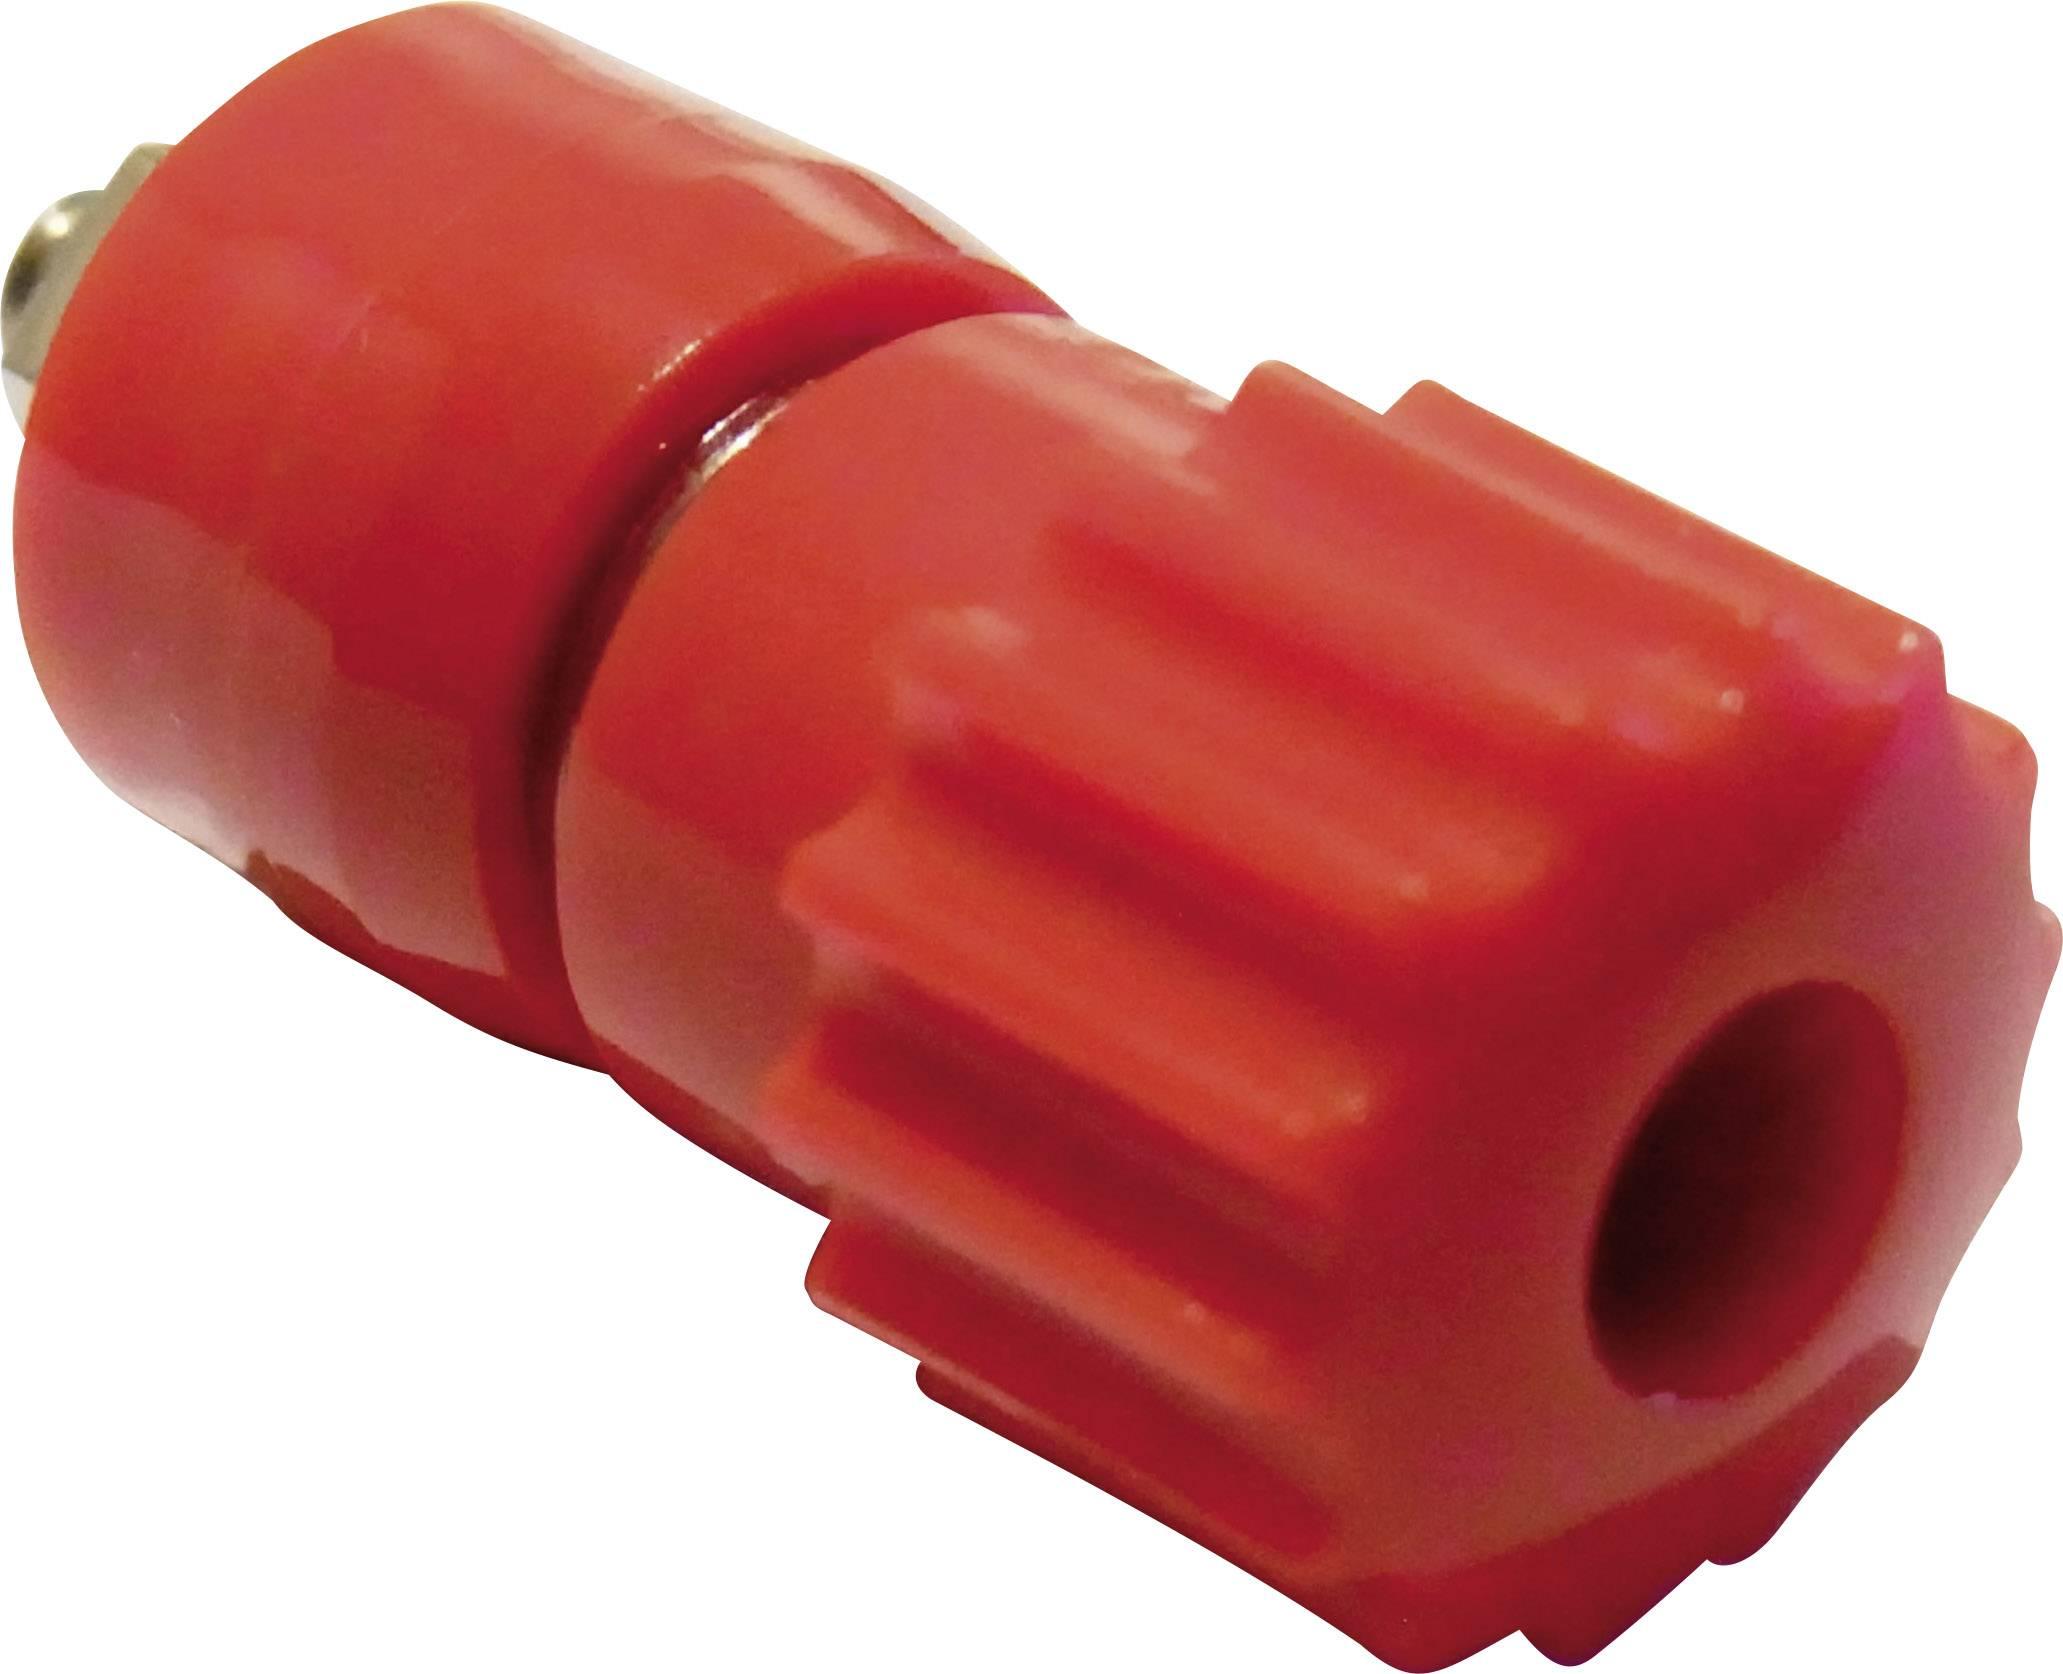 Pólová svorka Schnepp 16 A, červená, 1 ks